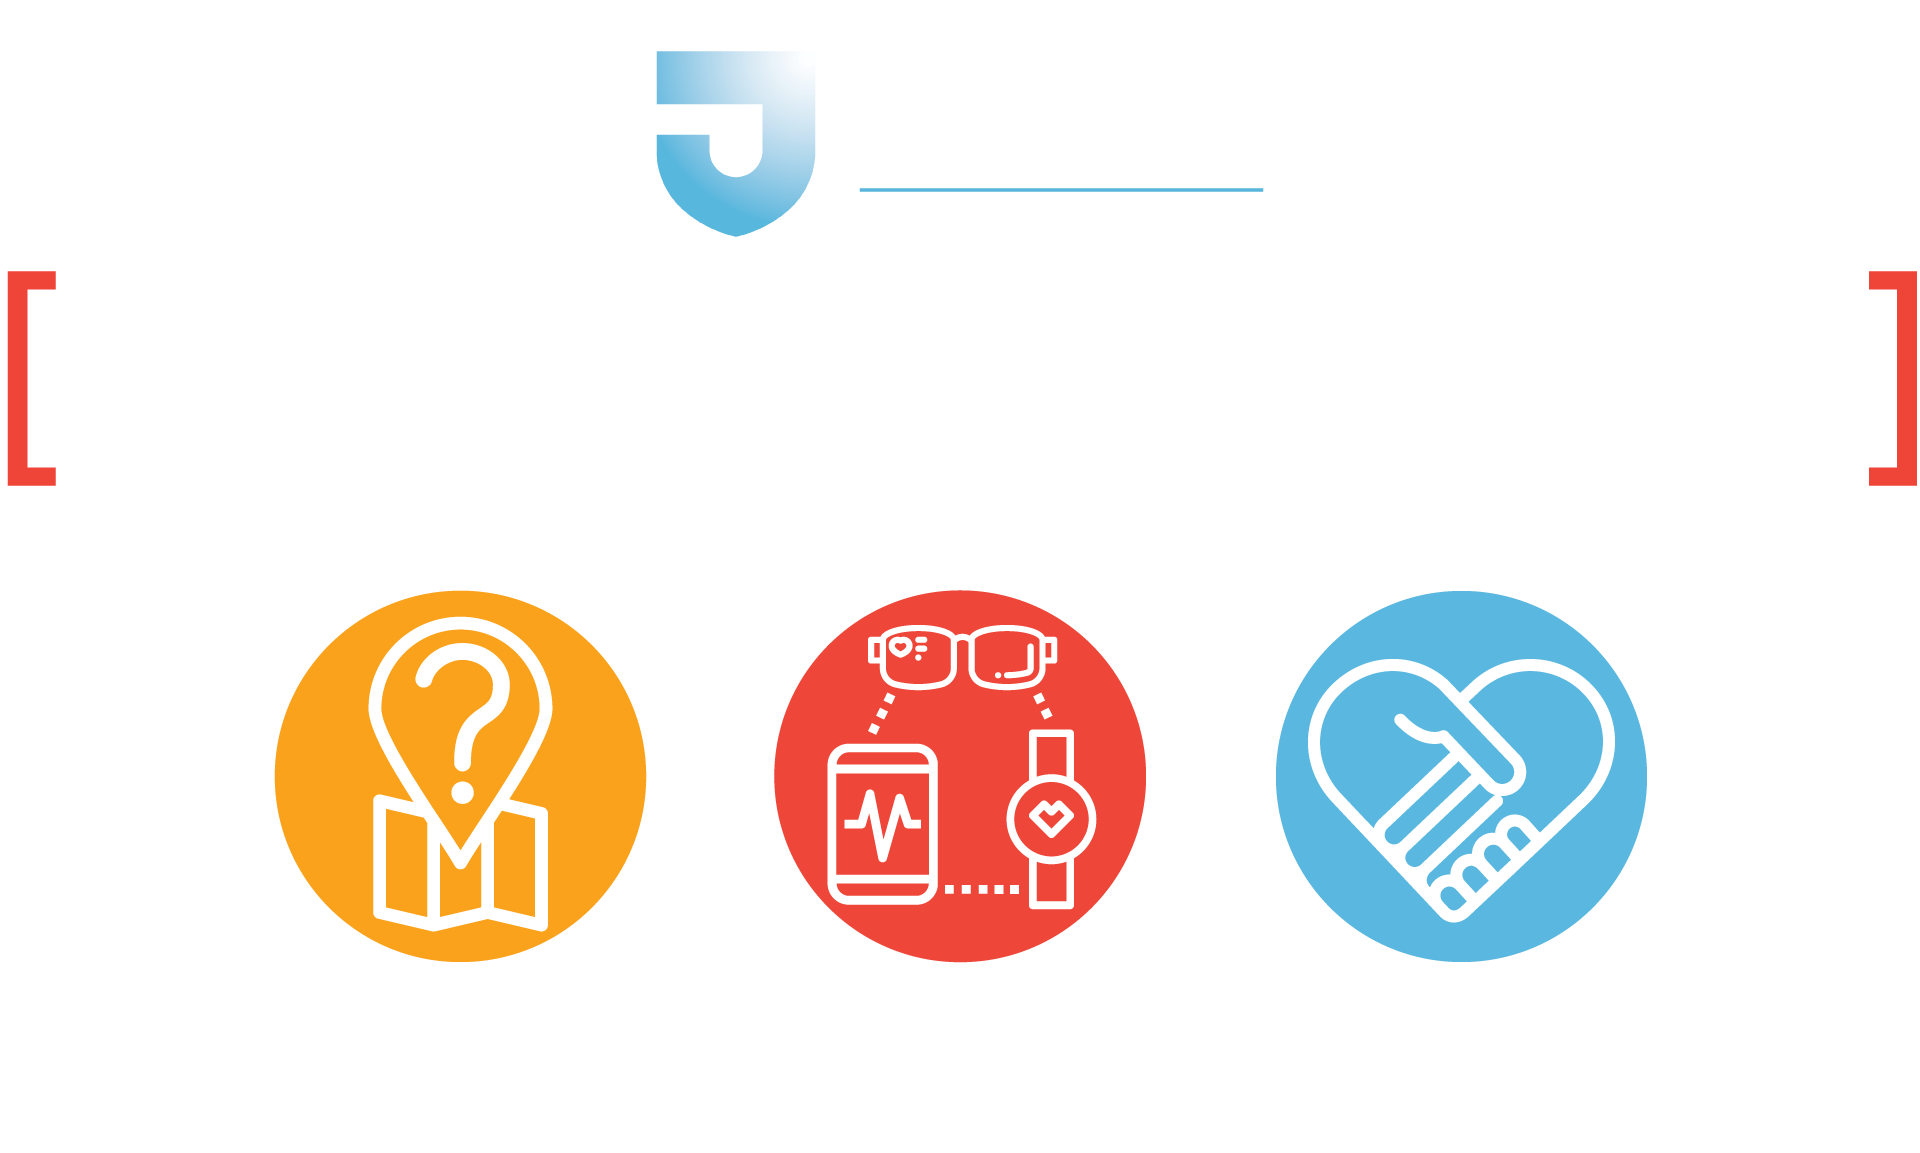 Jefferson-website-splash-header.png